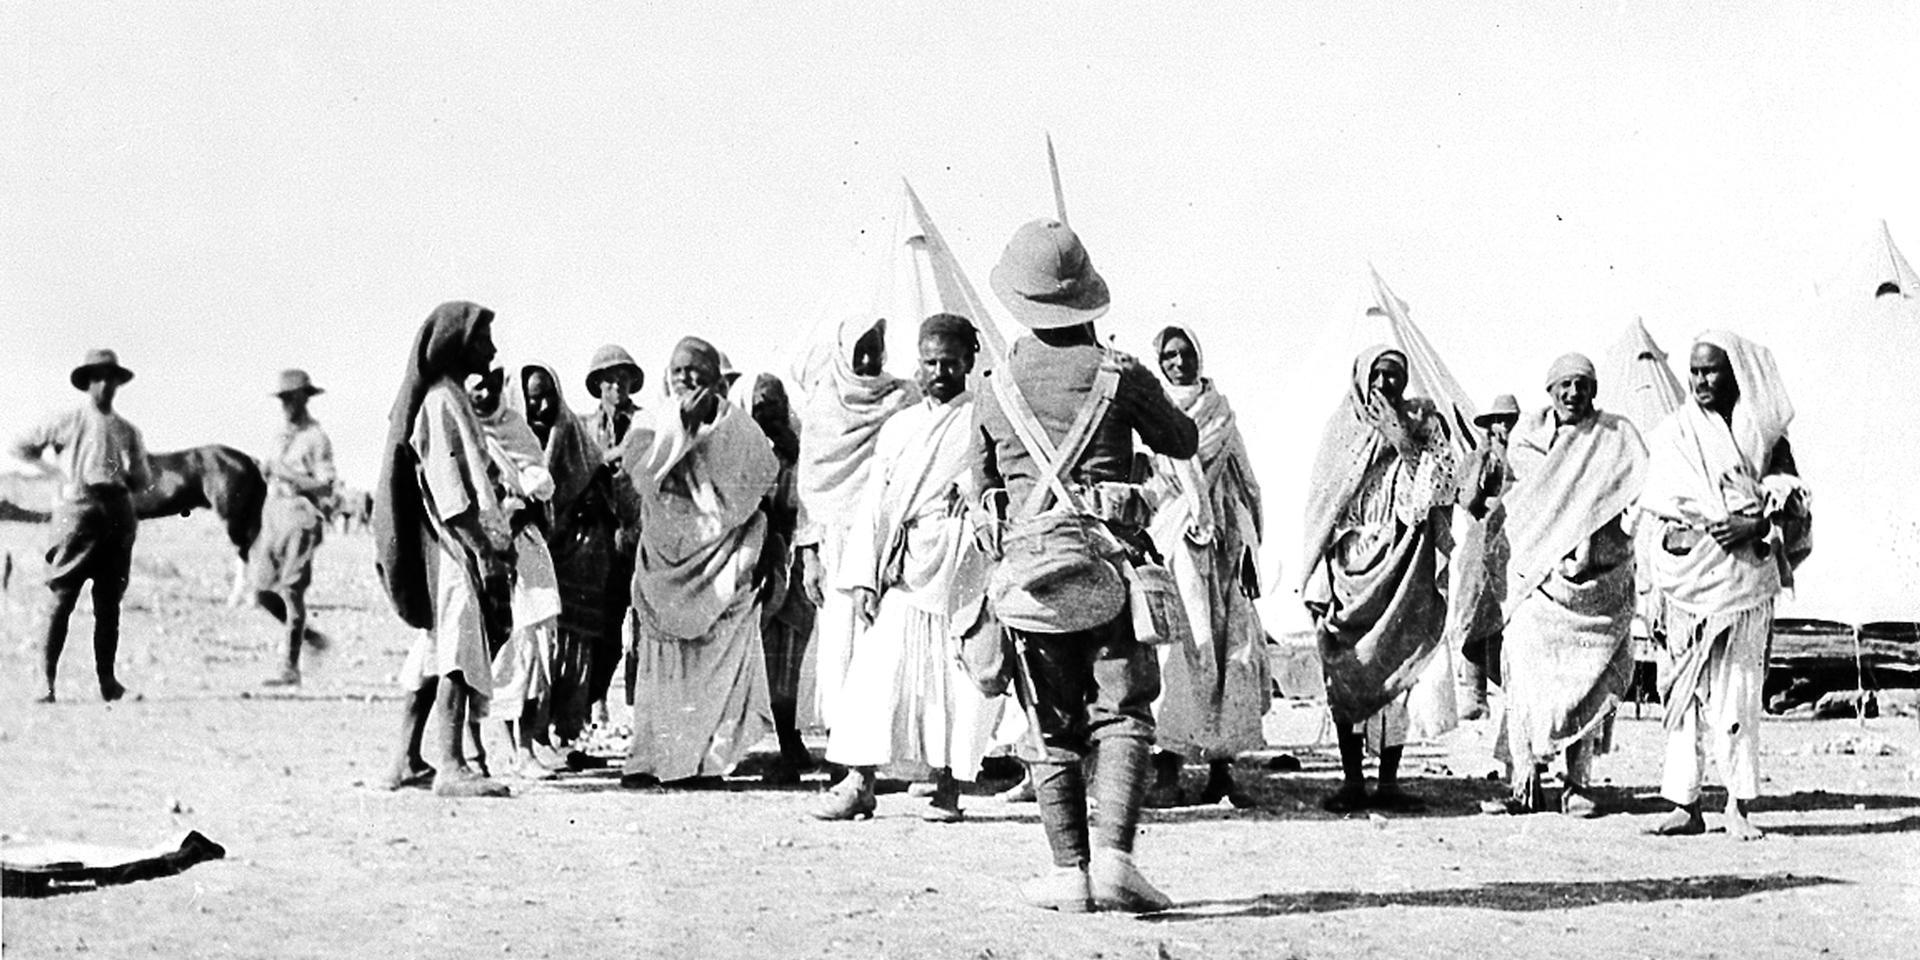 Bedouin prisoners at Mersa Matruh, 1915